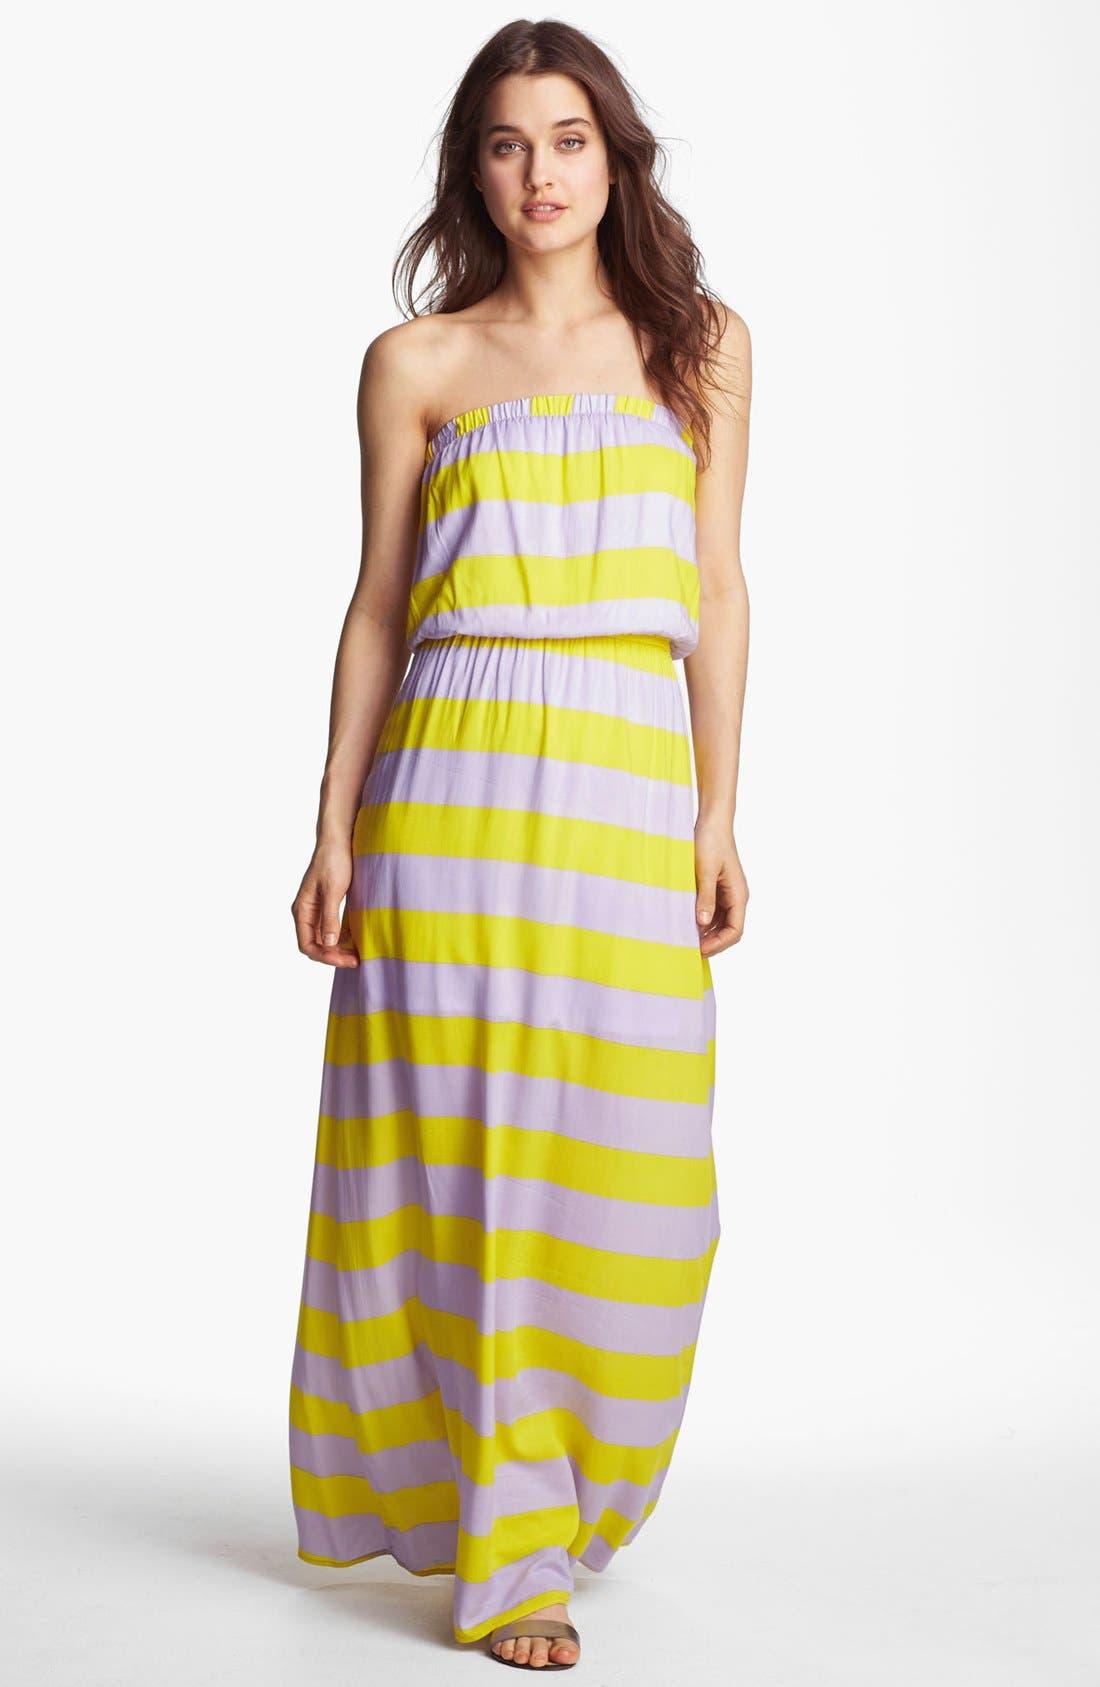 Alternate Image 1 Selected - Splendid 'Magnolia' Stripe Strapless Maxi Dress